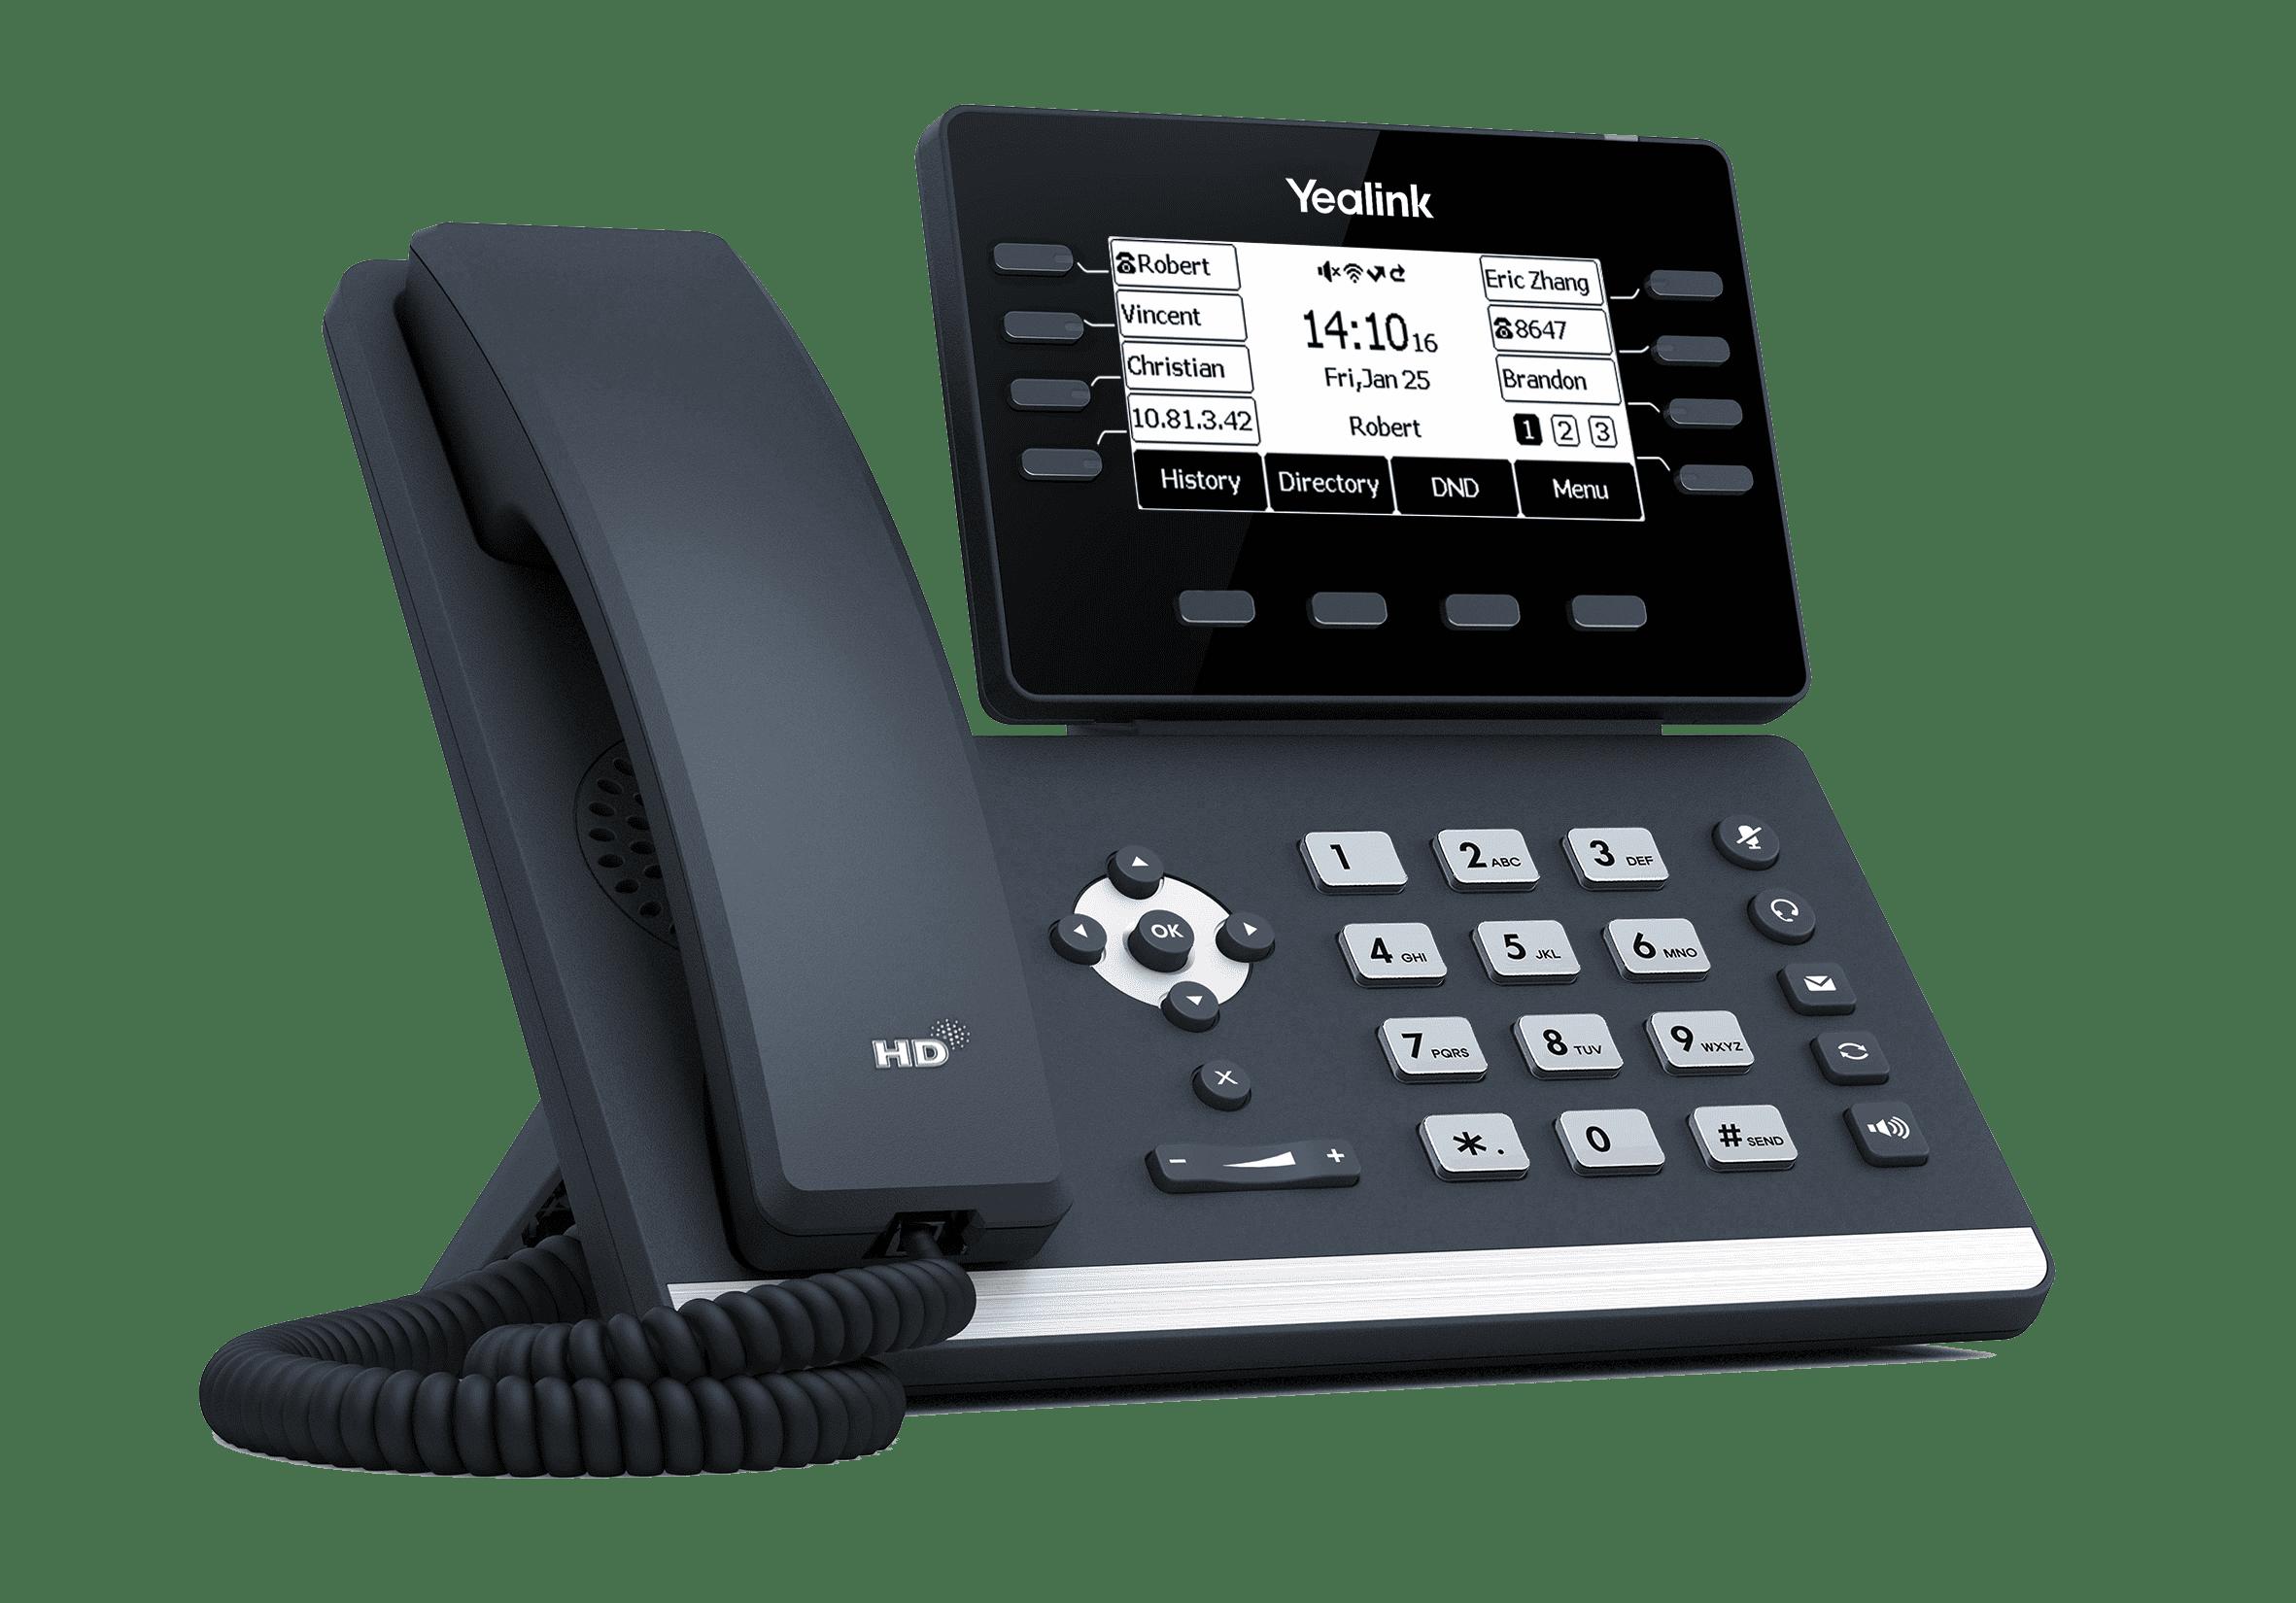 Yealink T53W Model Phone